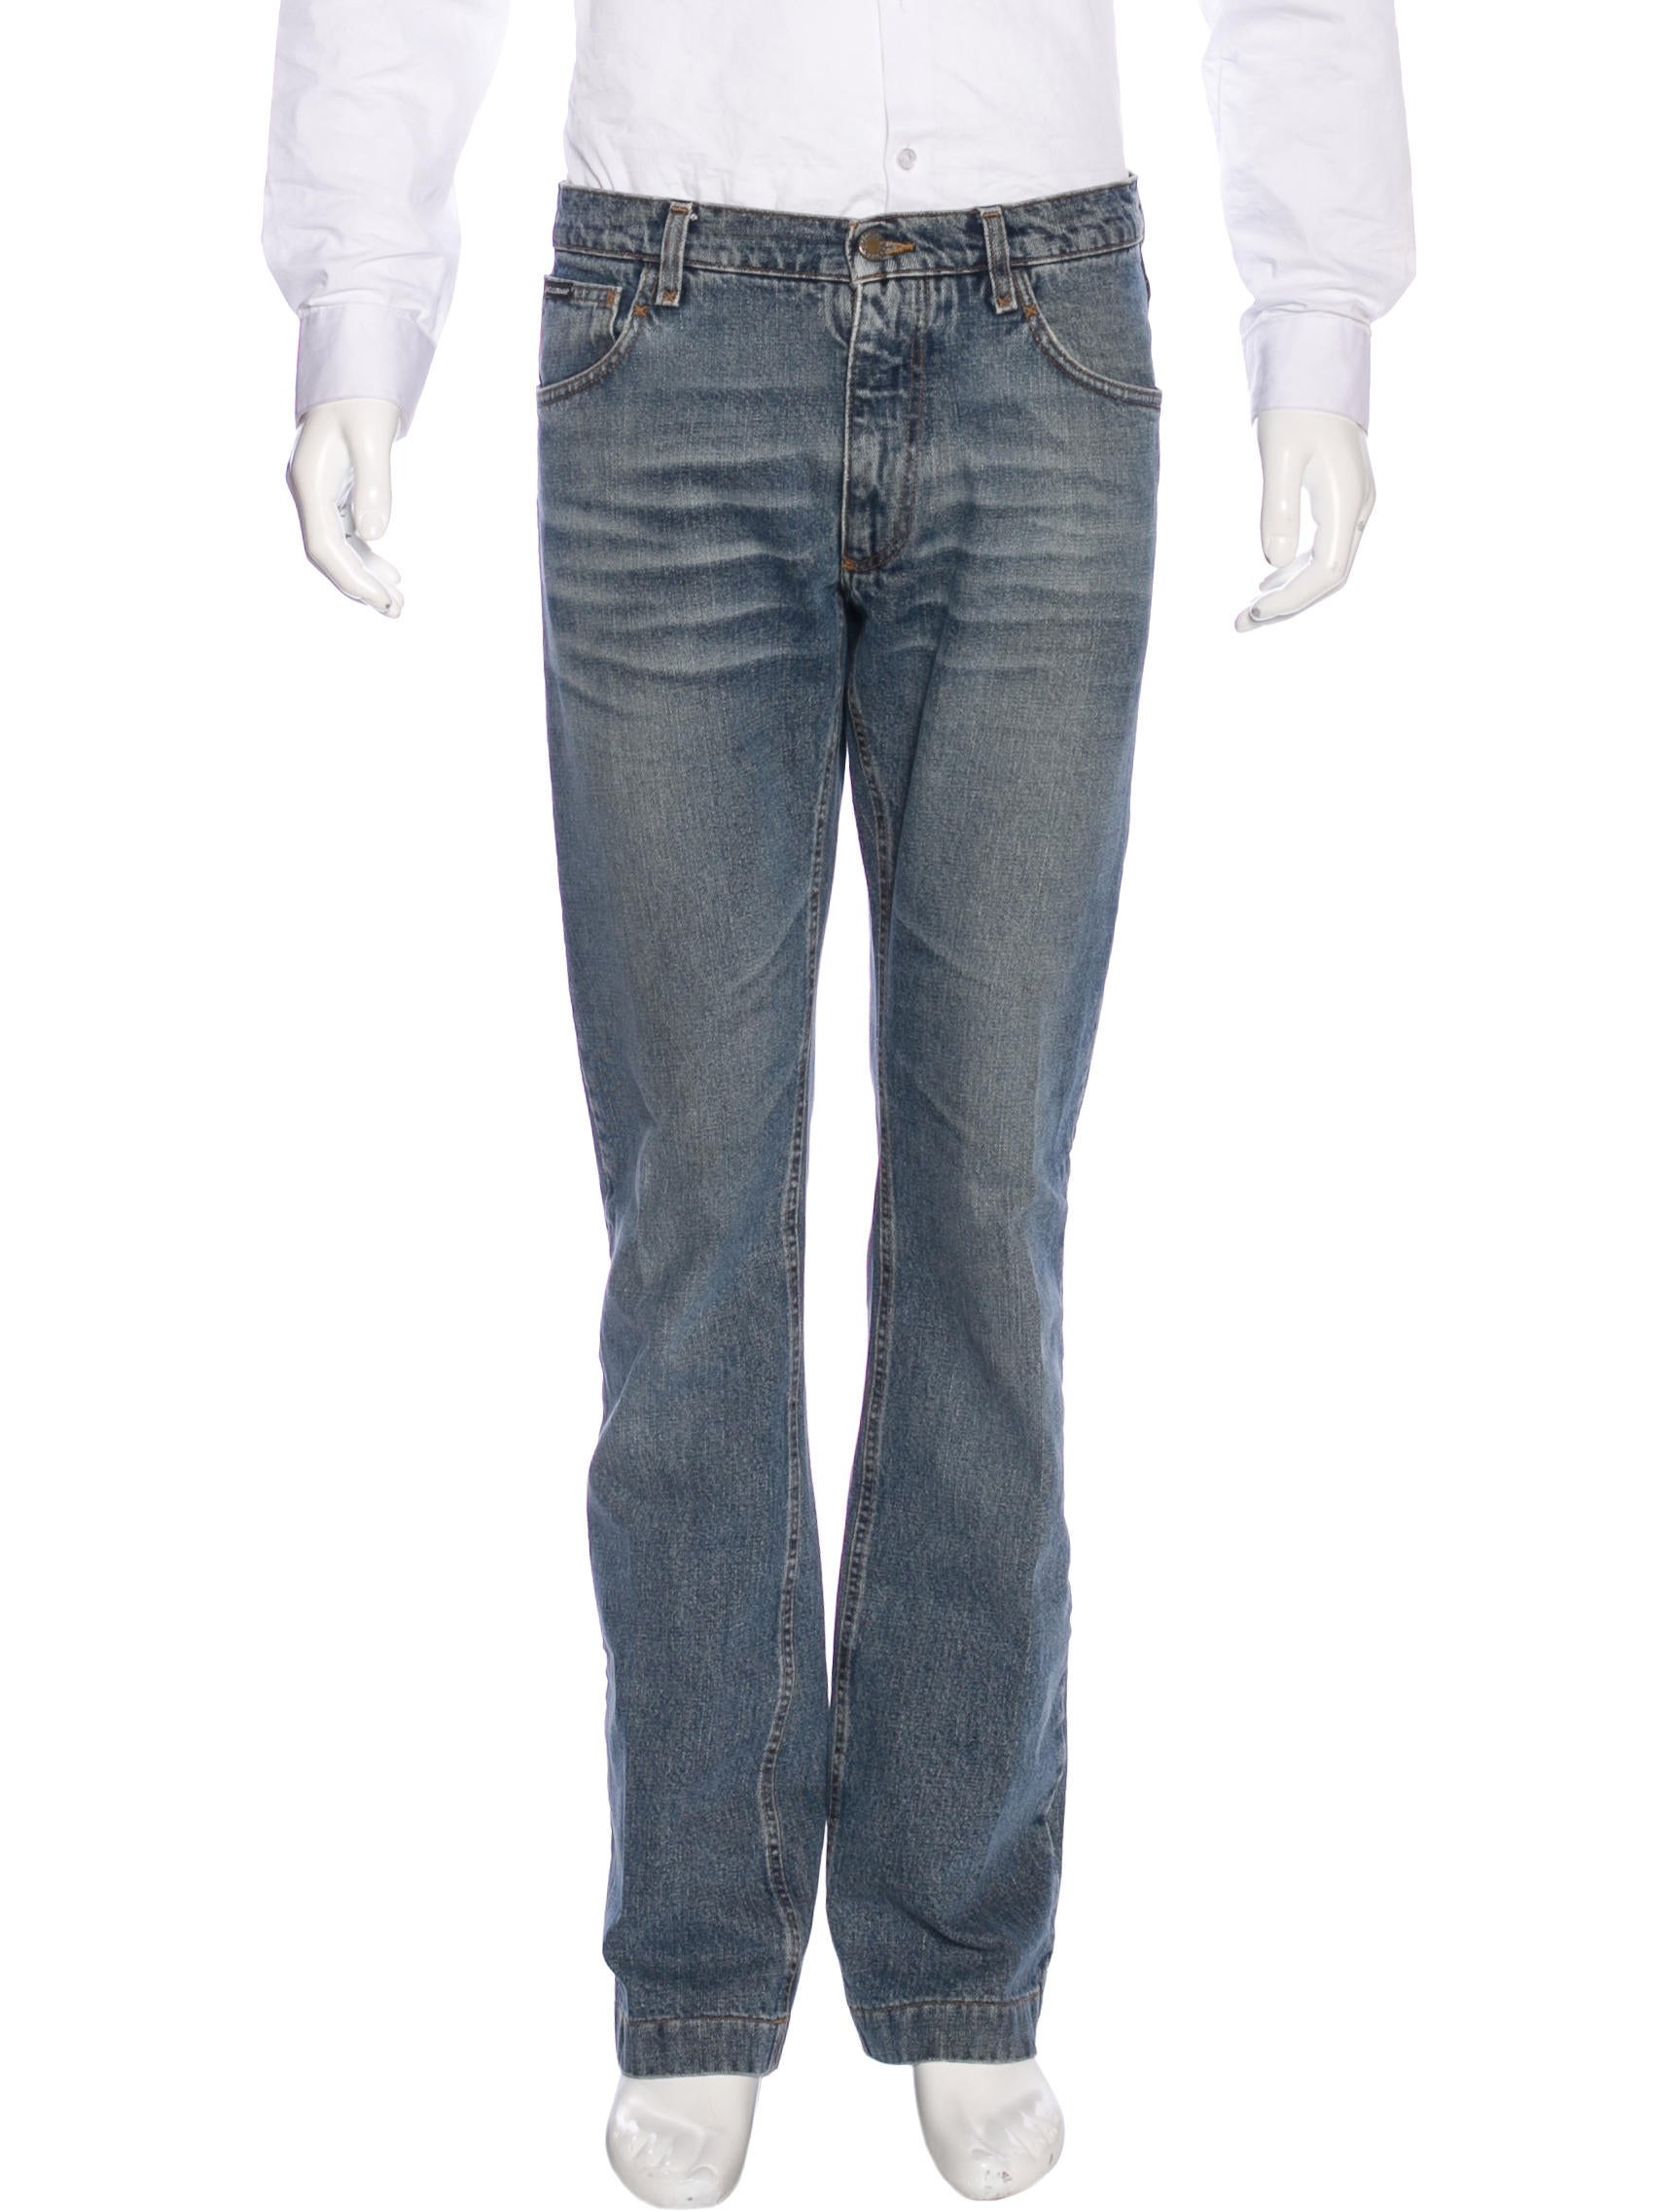 dolce gabbana five pocket straight leg jeans clothing dag86803 the realreal. Black Bedroom Furniture Sets. Home Design Ideas